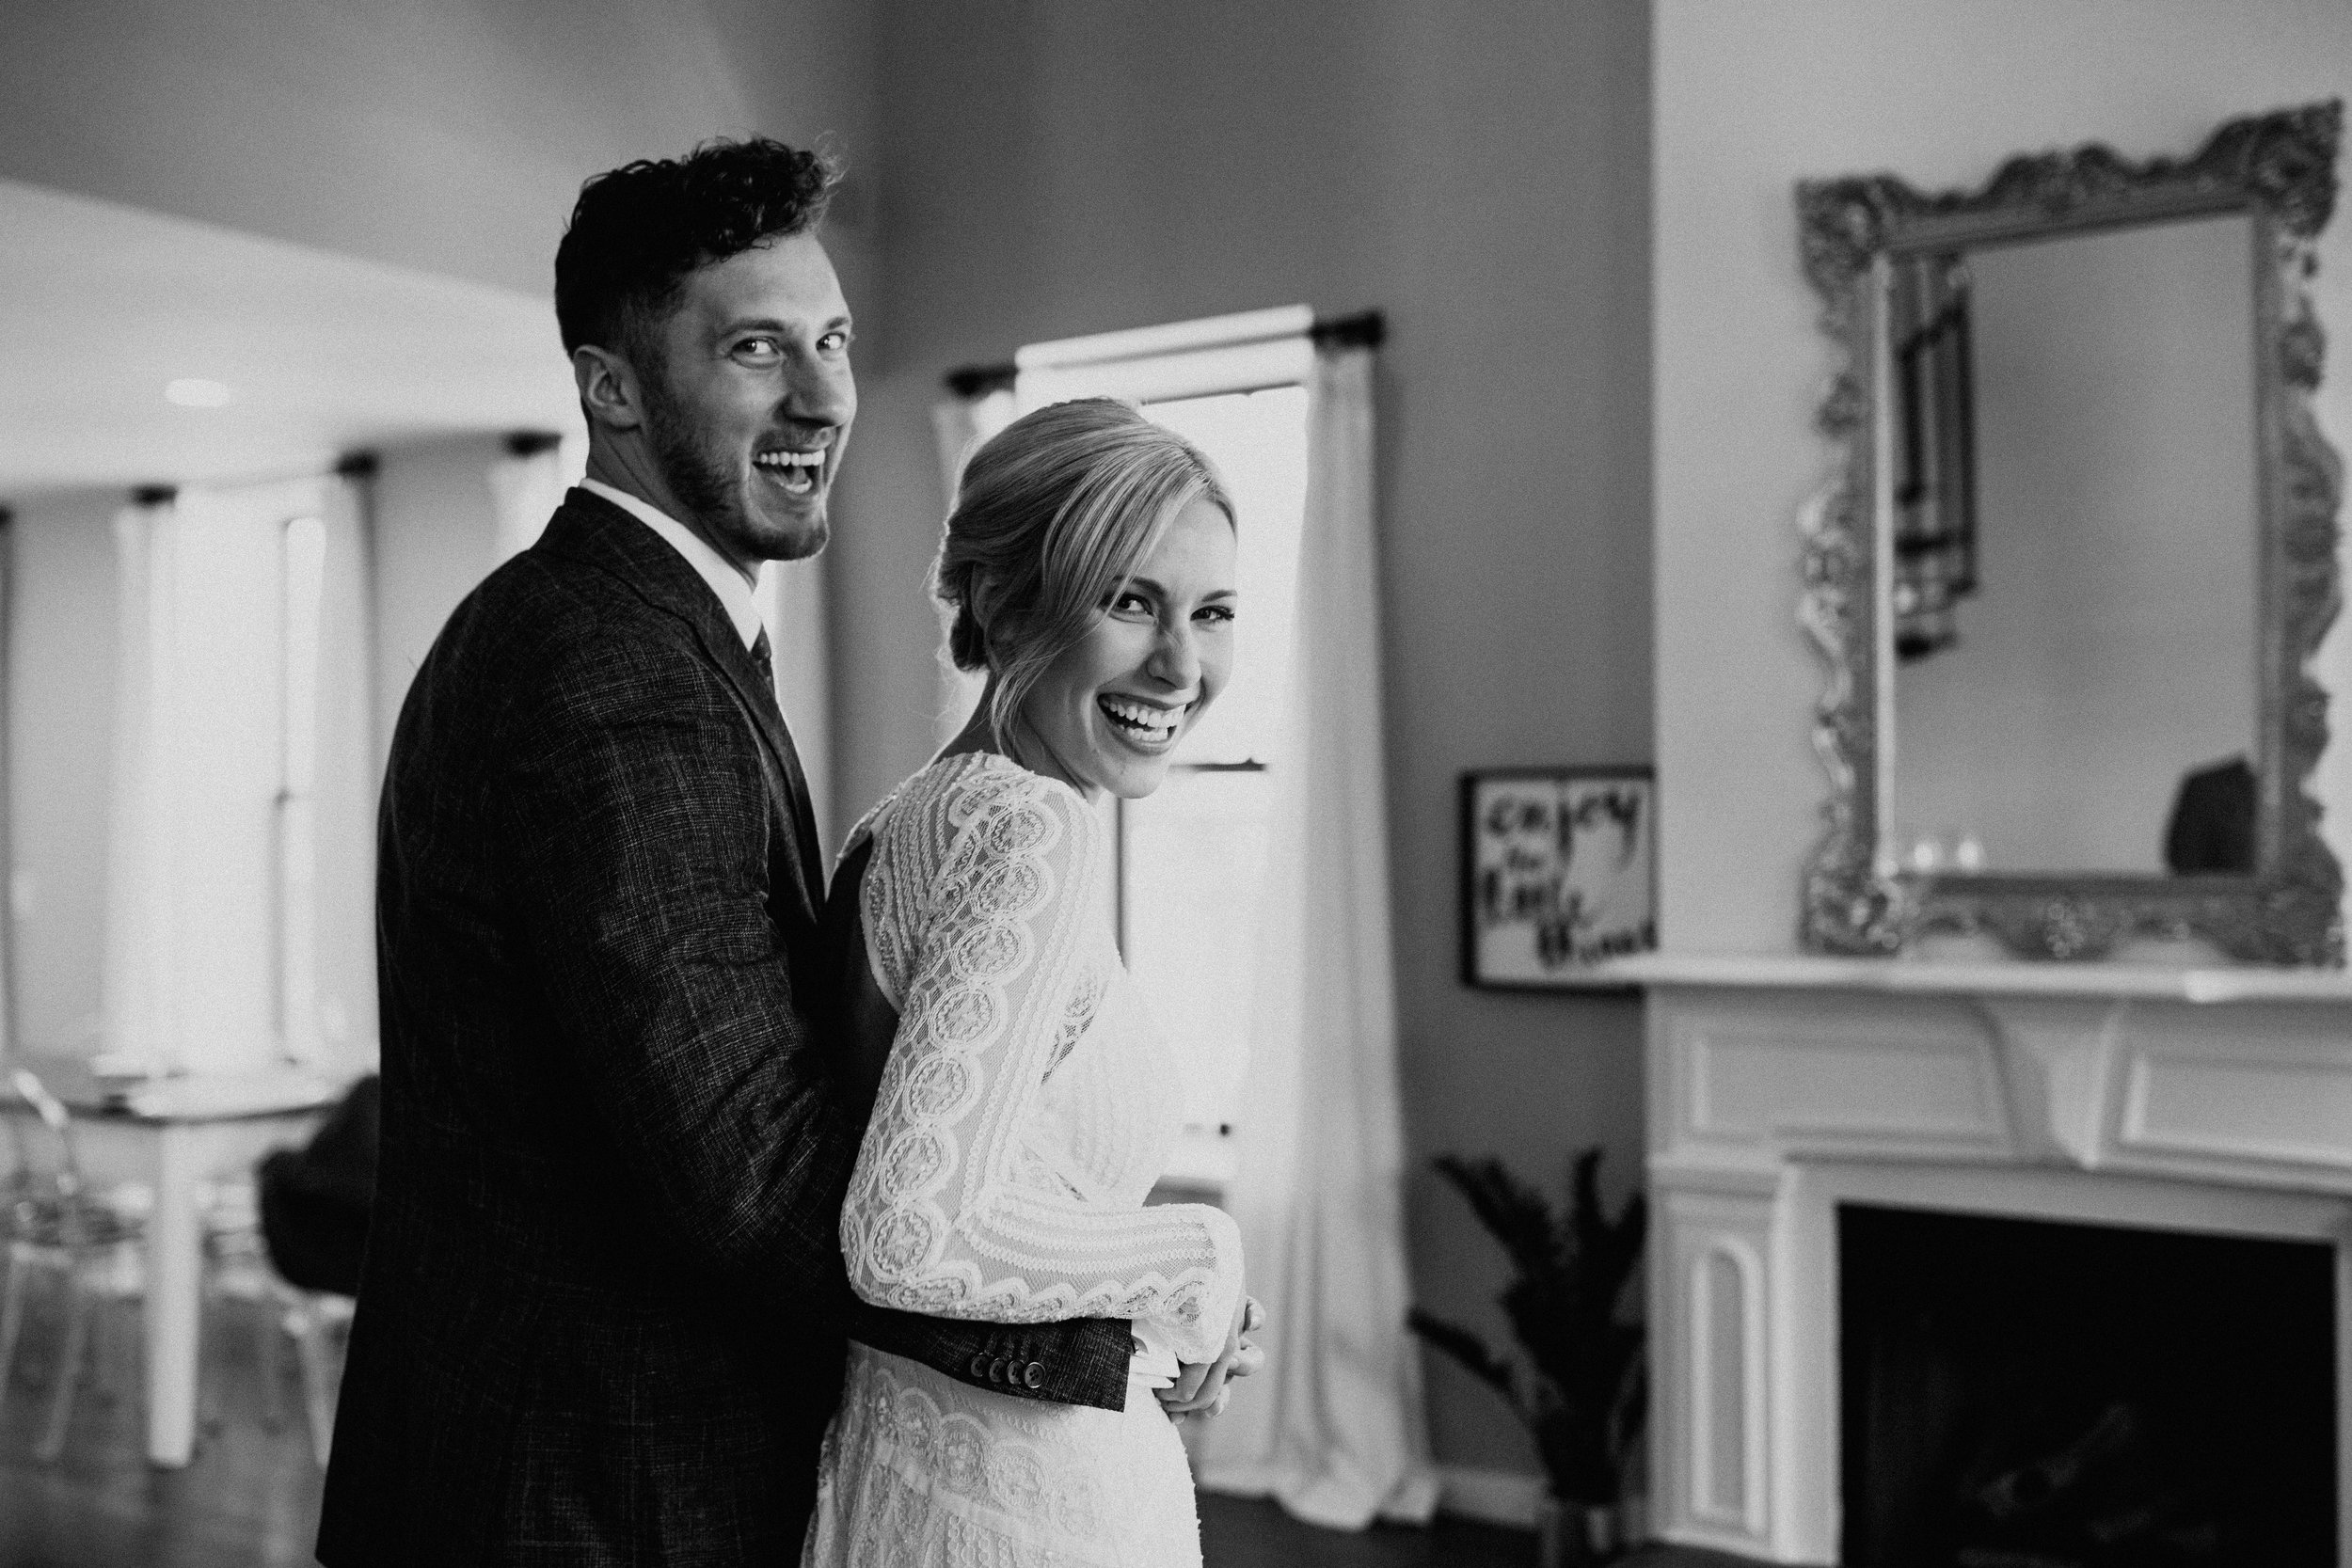 ST_LOUIS_WEDDING_PHOTOGRAPHER_WILD_CARROT_EMILY_AND_JOES_WINTER_WEDDING-317.jpg